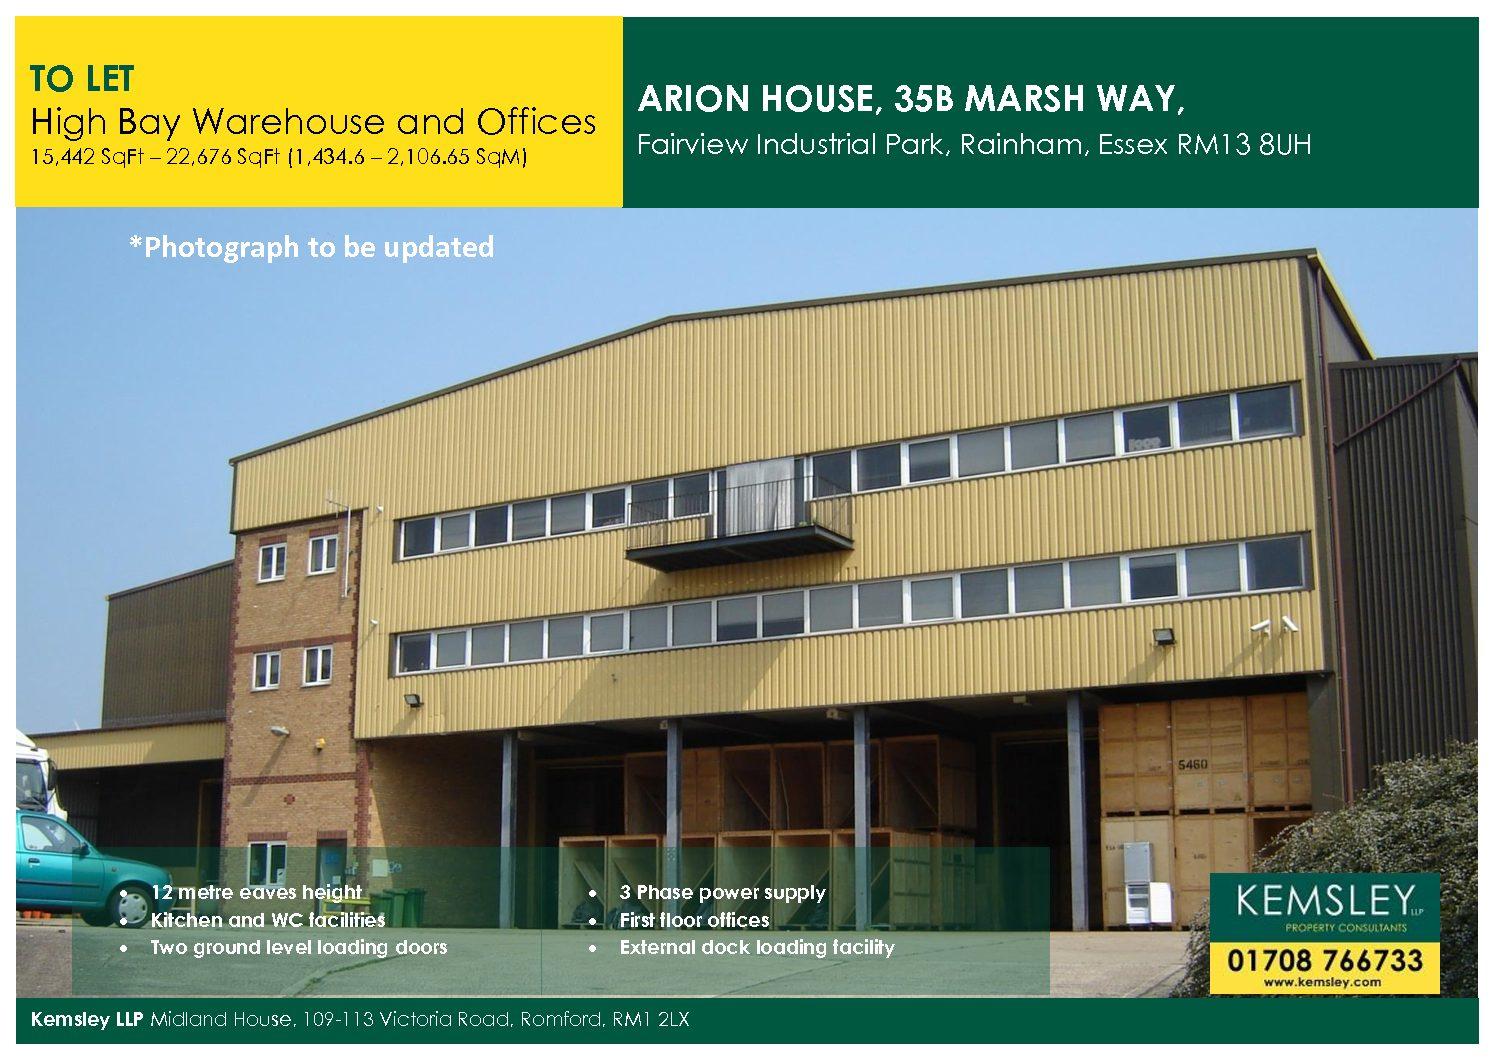 Arion House, 35B Marsh Way